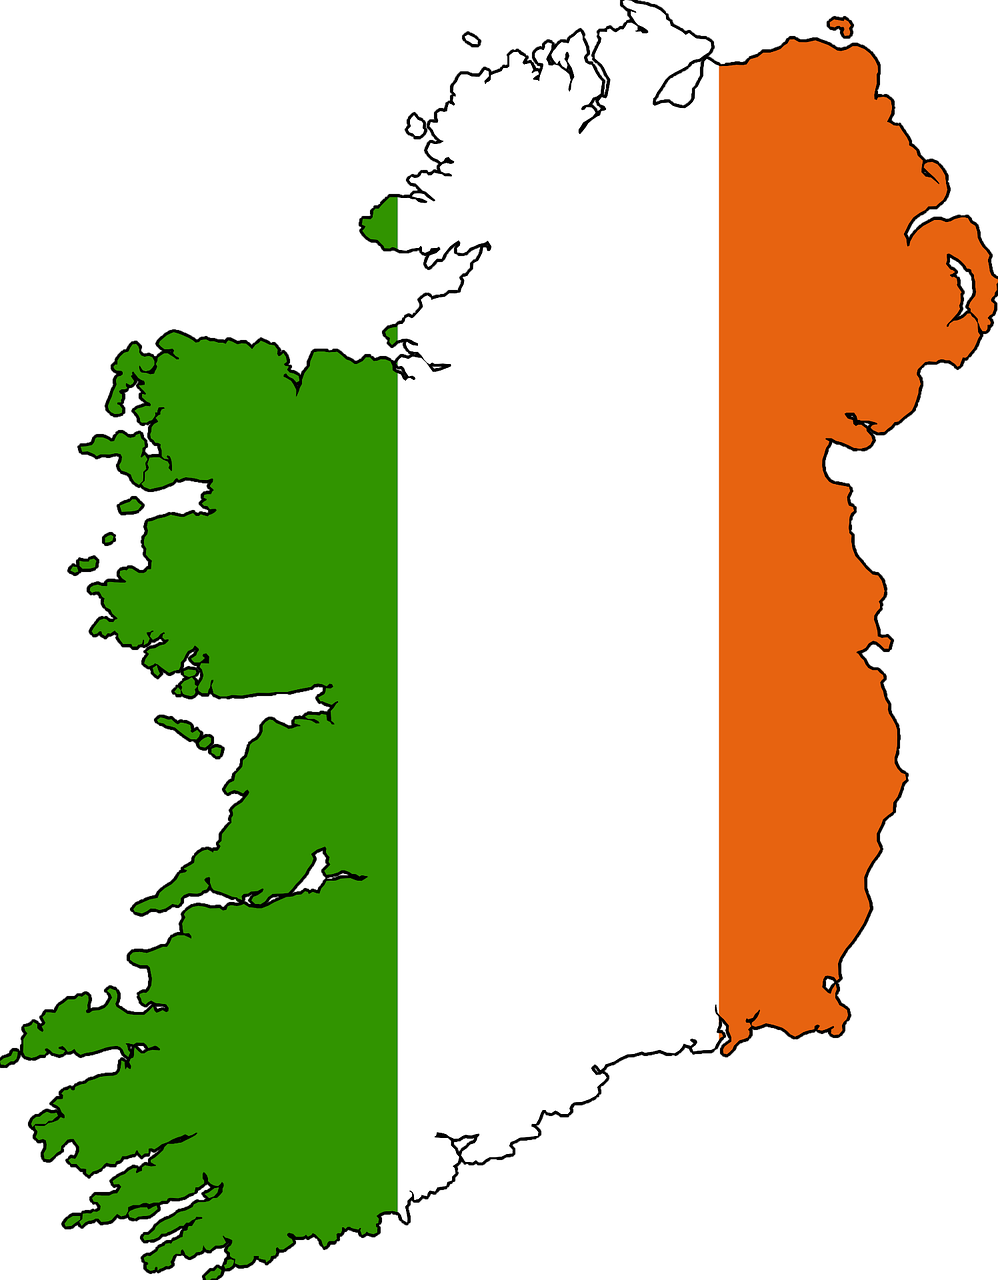 Ireland map drawn holiday. Europe clipart vacation europe